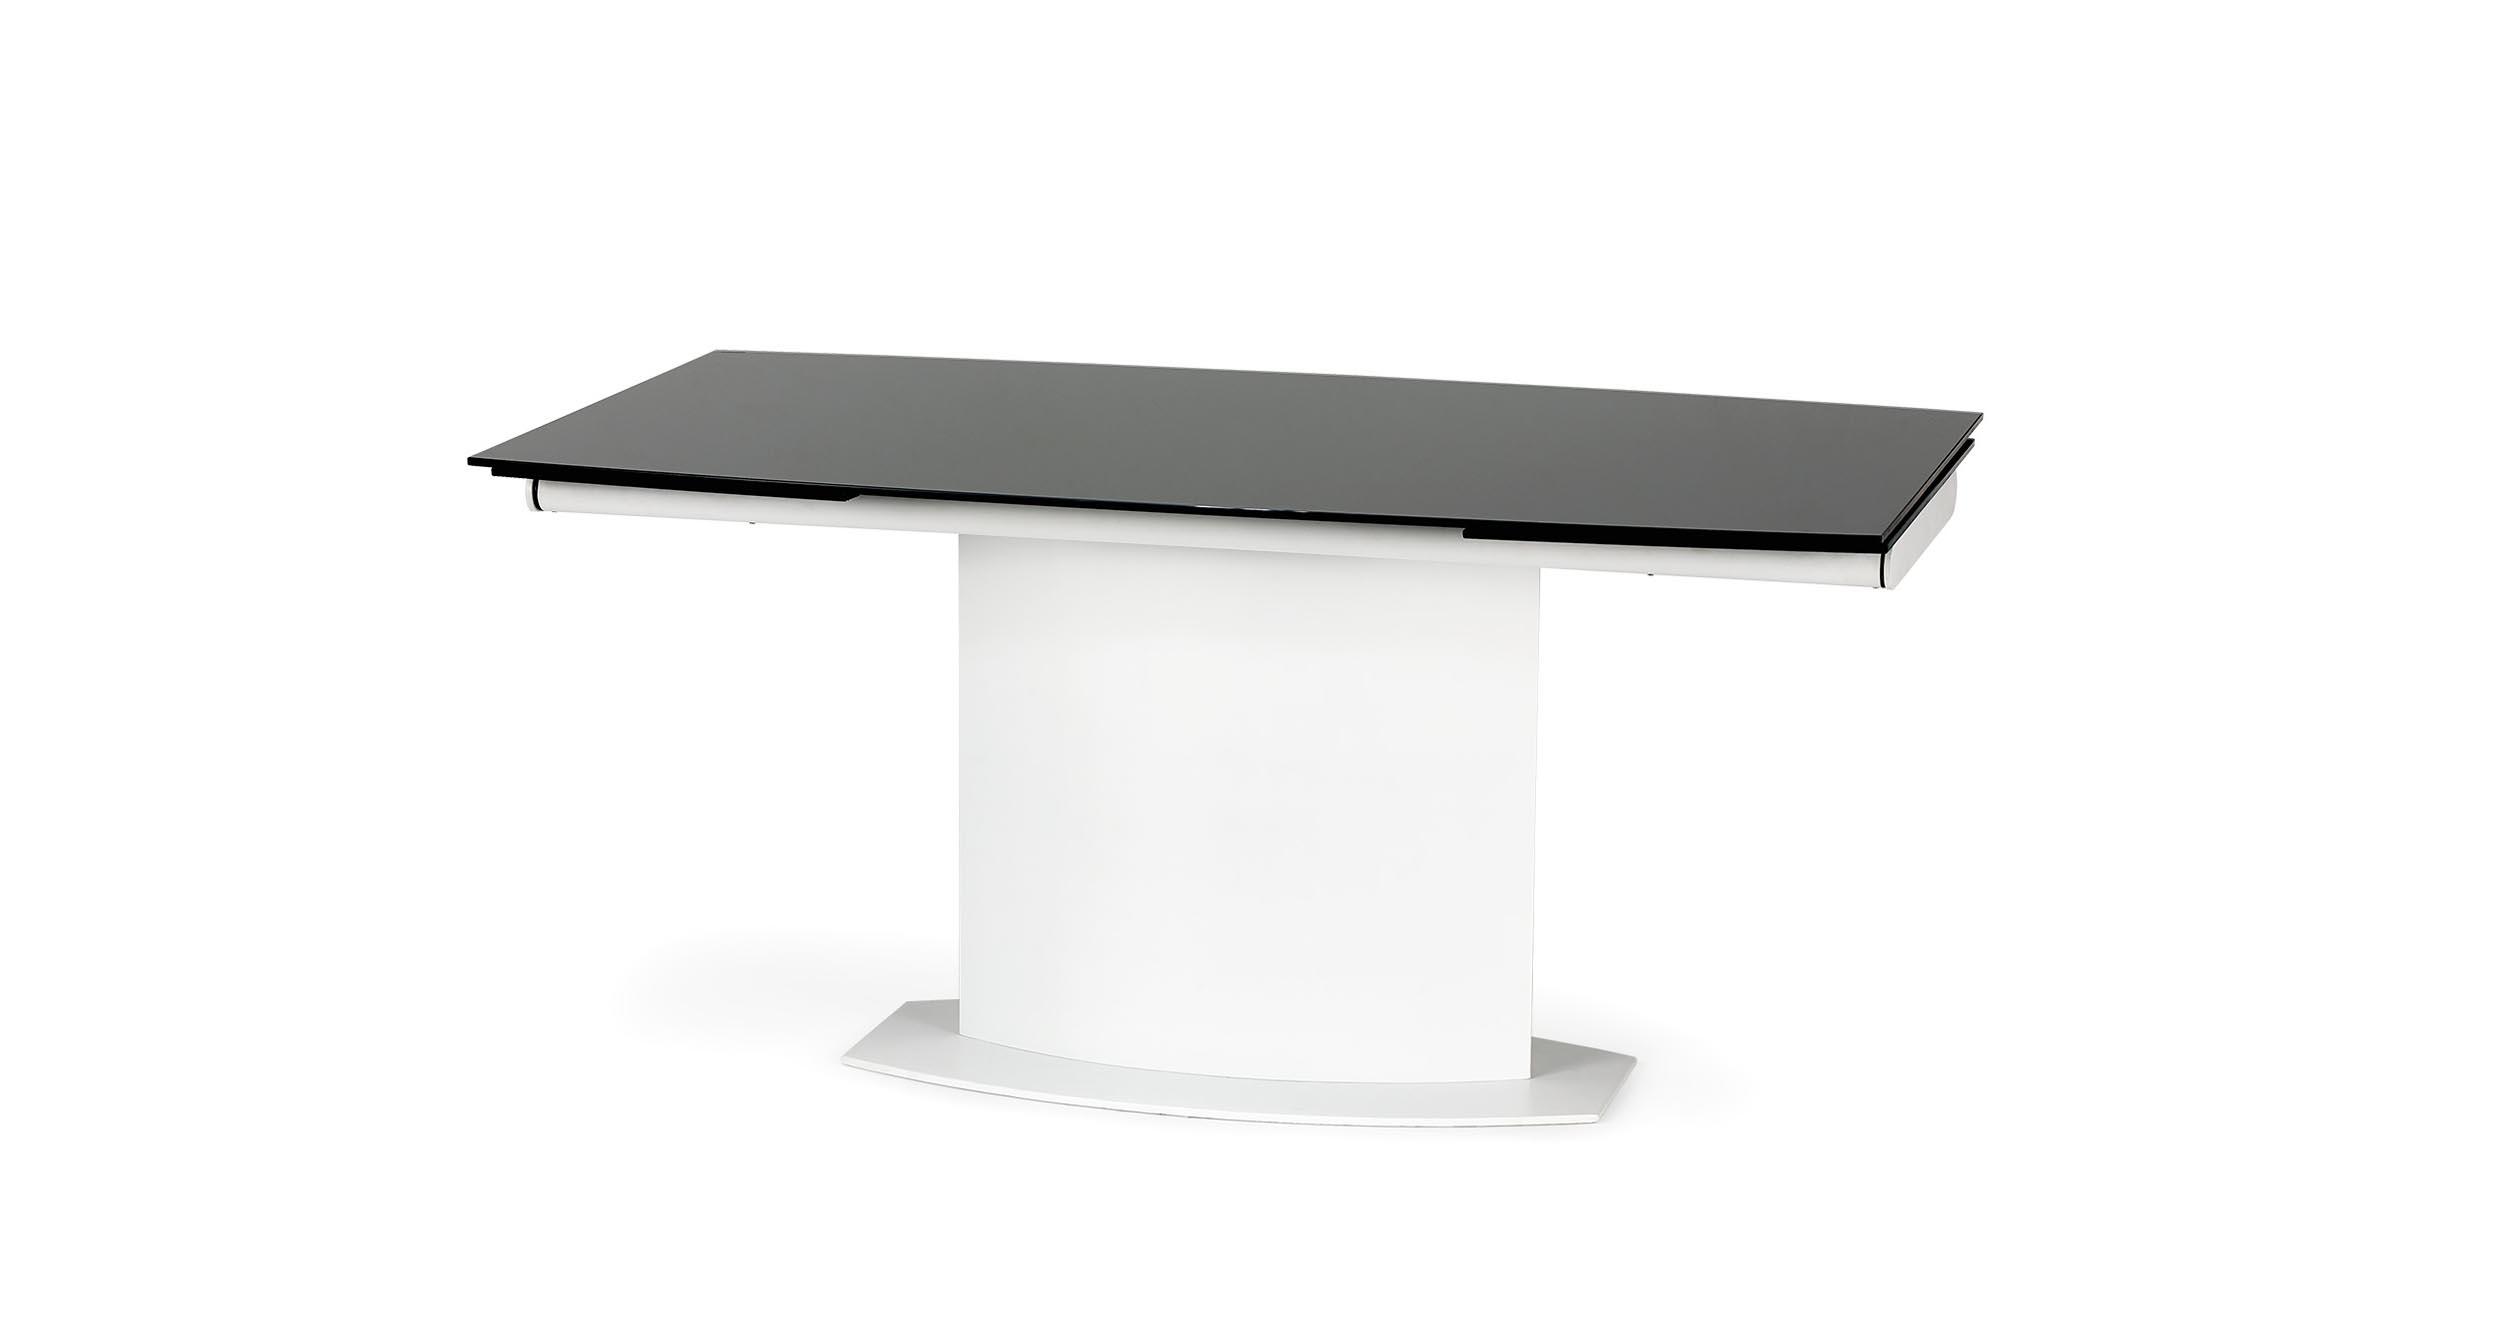 Masa extensibila din sticla si metal Anderson Black / White, L160-250xl90xH76 cm vivre.ro